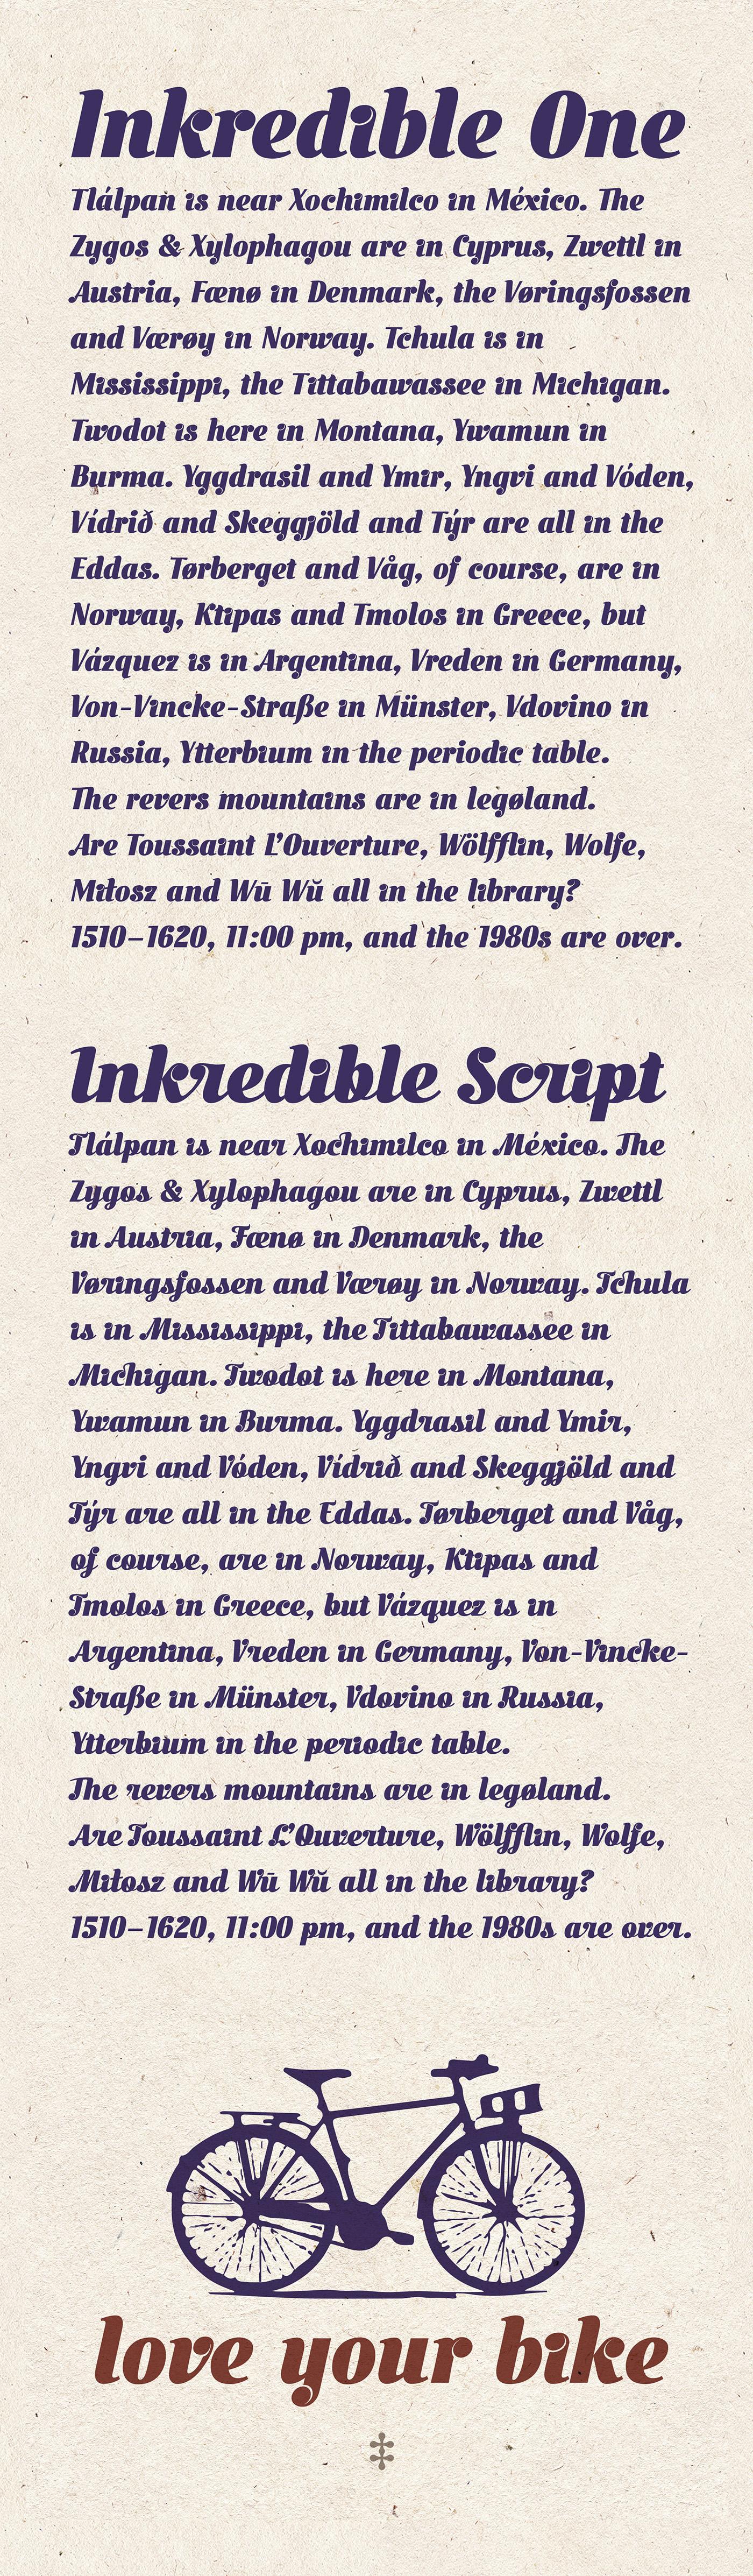 Inkredible scroll image